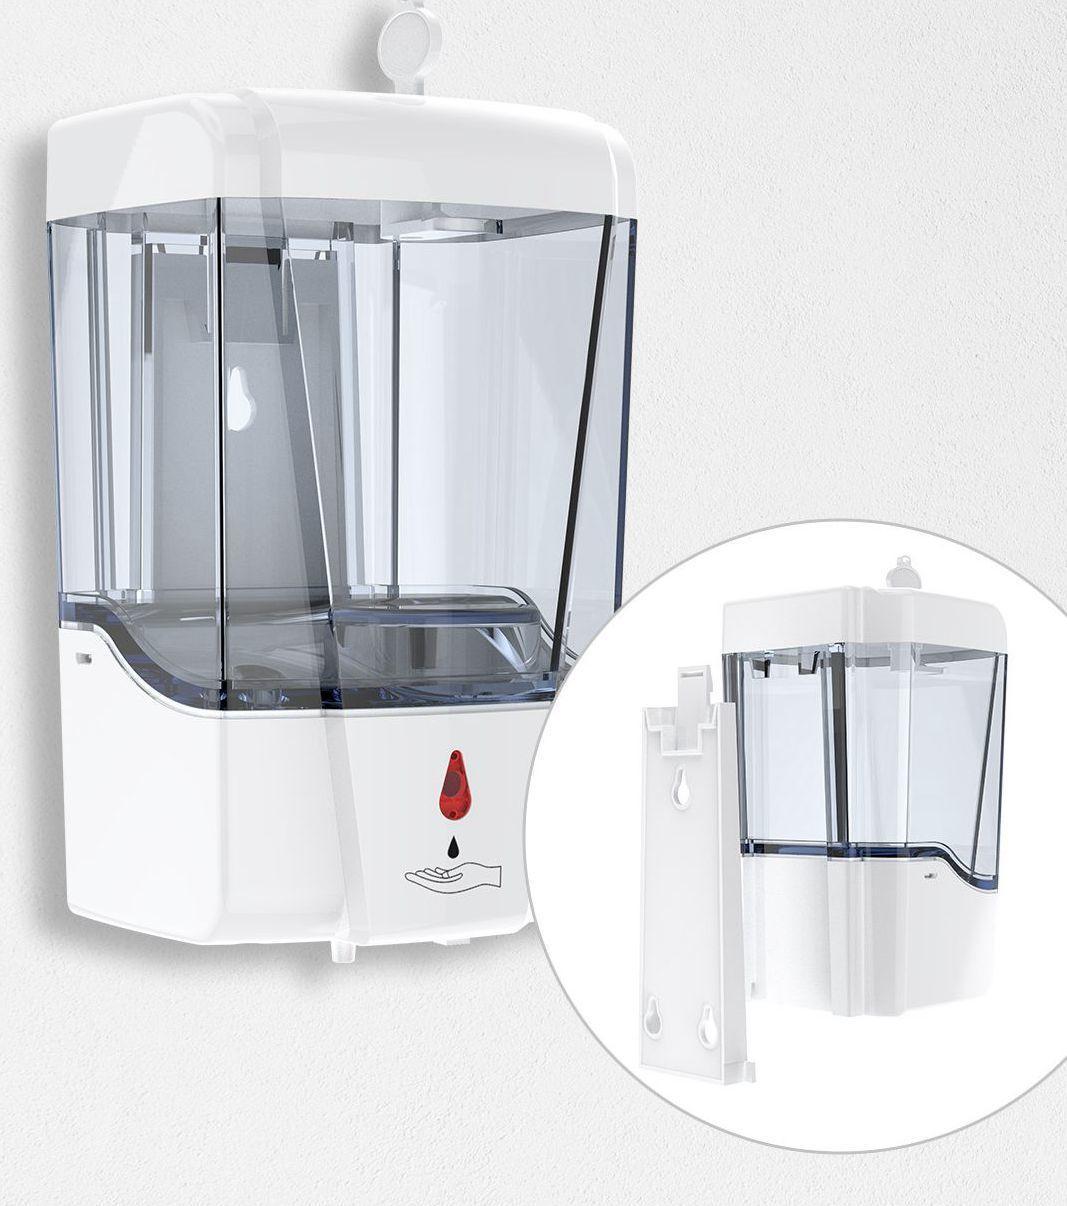 Sensor inteligente 700 ml automático dispensador de jabón Touchless USB Baño Alimentador del jabón líquido de manos libres Touchless dispensador del desinfectante KKA7901-3